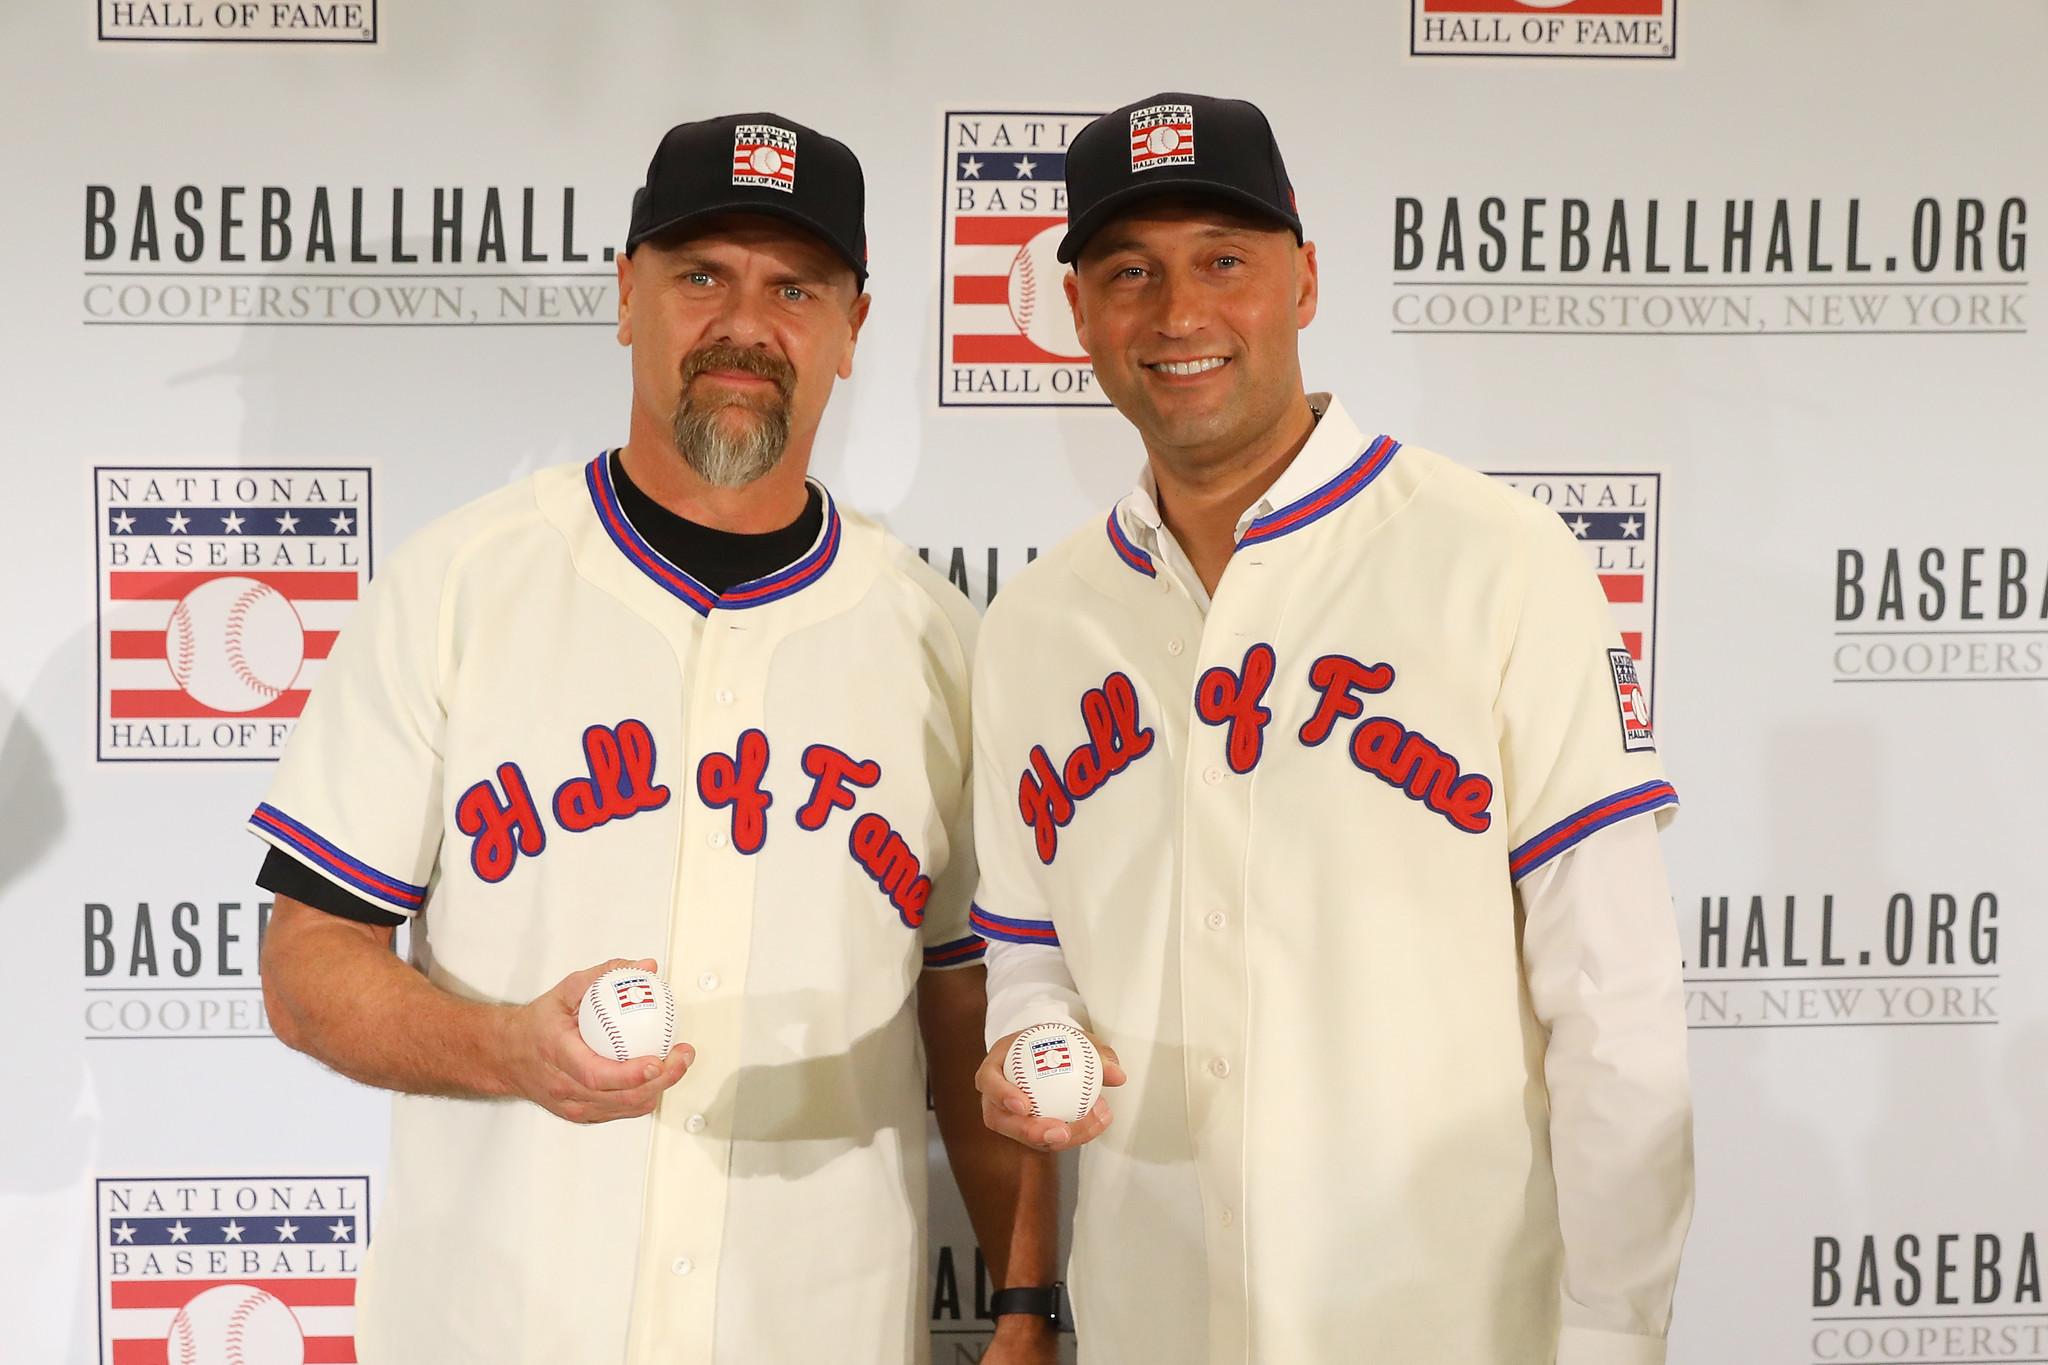 Celebrating Derek Jeter won't cure baseball's problems